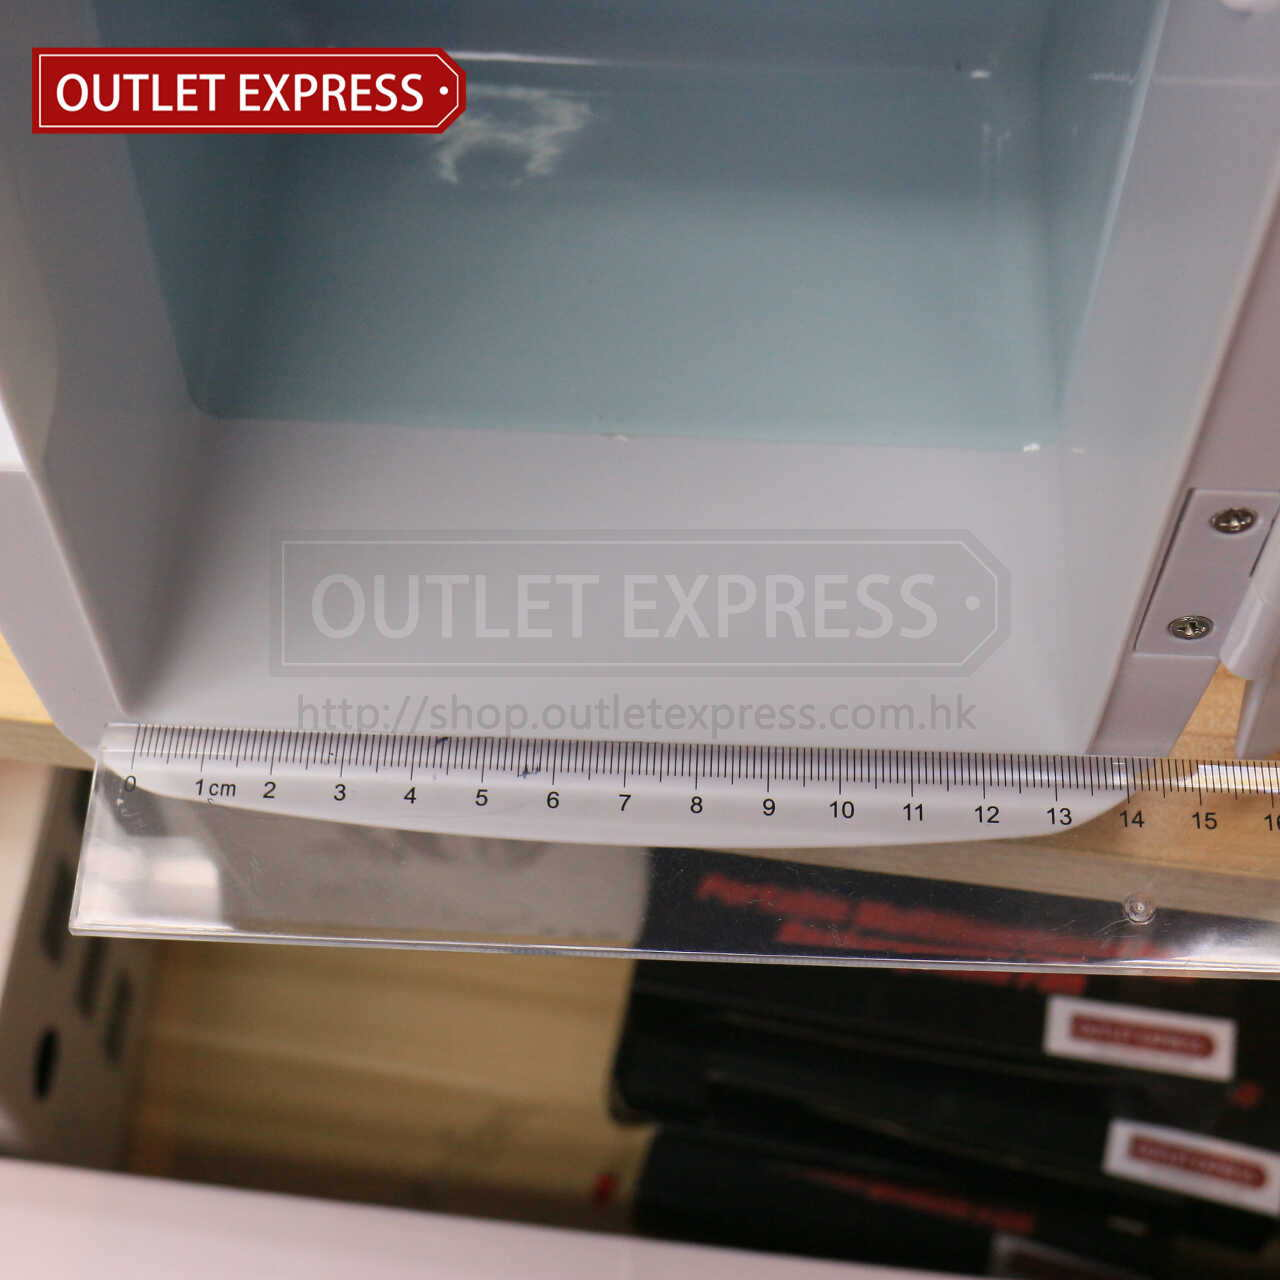 4L 冷暖兩用迷你小雪櫃 | 可車載或家用- Outlet Express HK生活百貨城實拍相片